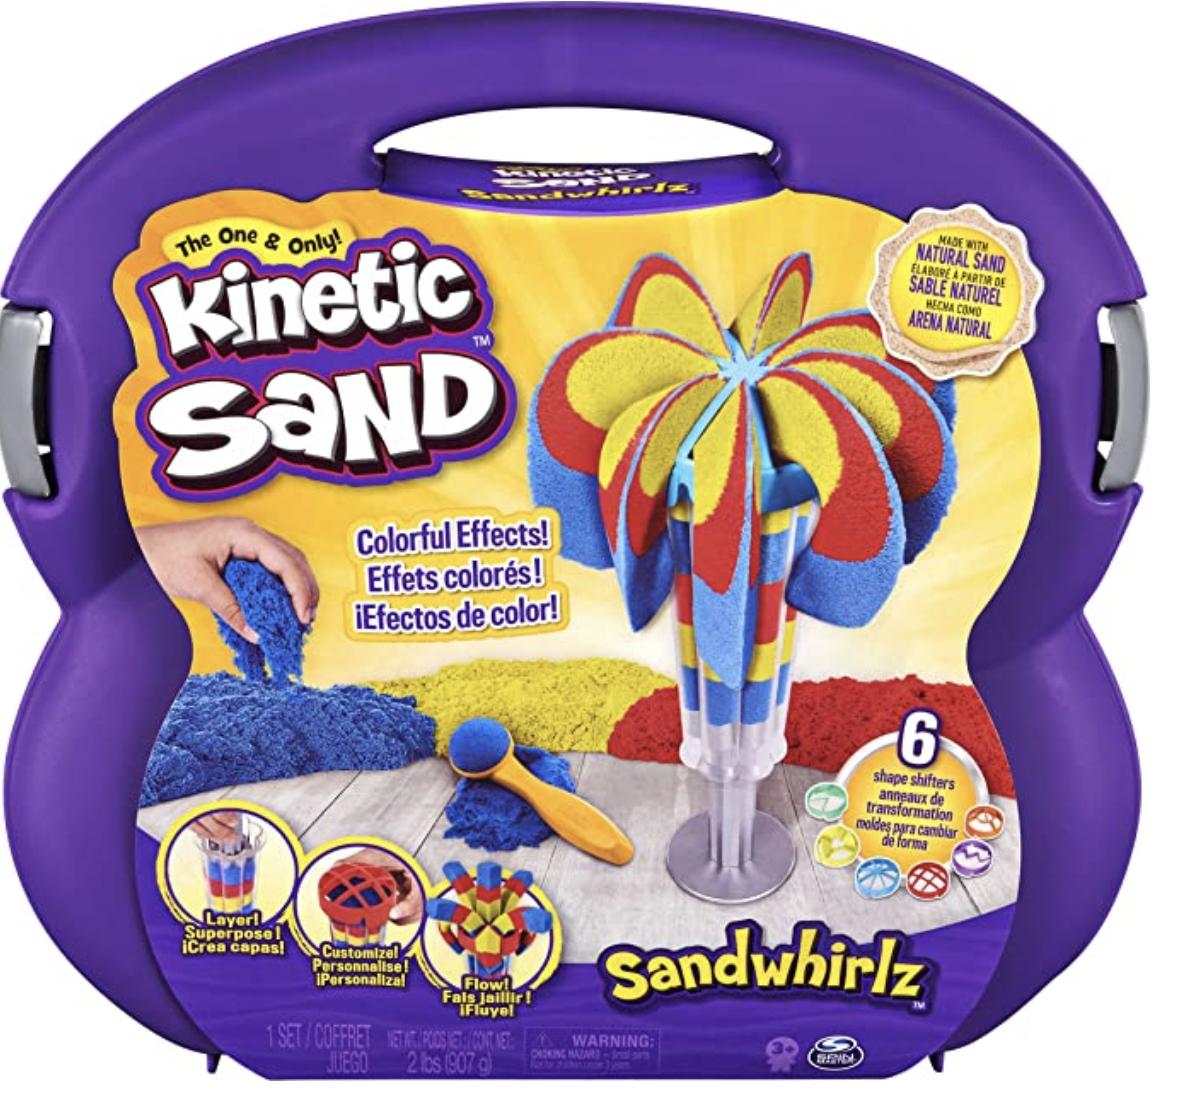 Kinetic Sand Sandwhirlz Playset with 3 Colours of Kinetic Sand (907g) - £12.99 (+£4.49 Non-Prime) @ Amazon